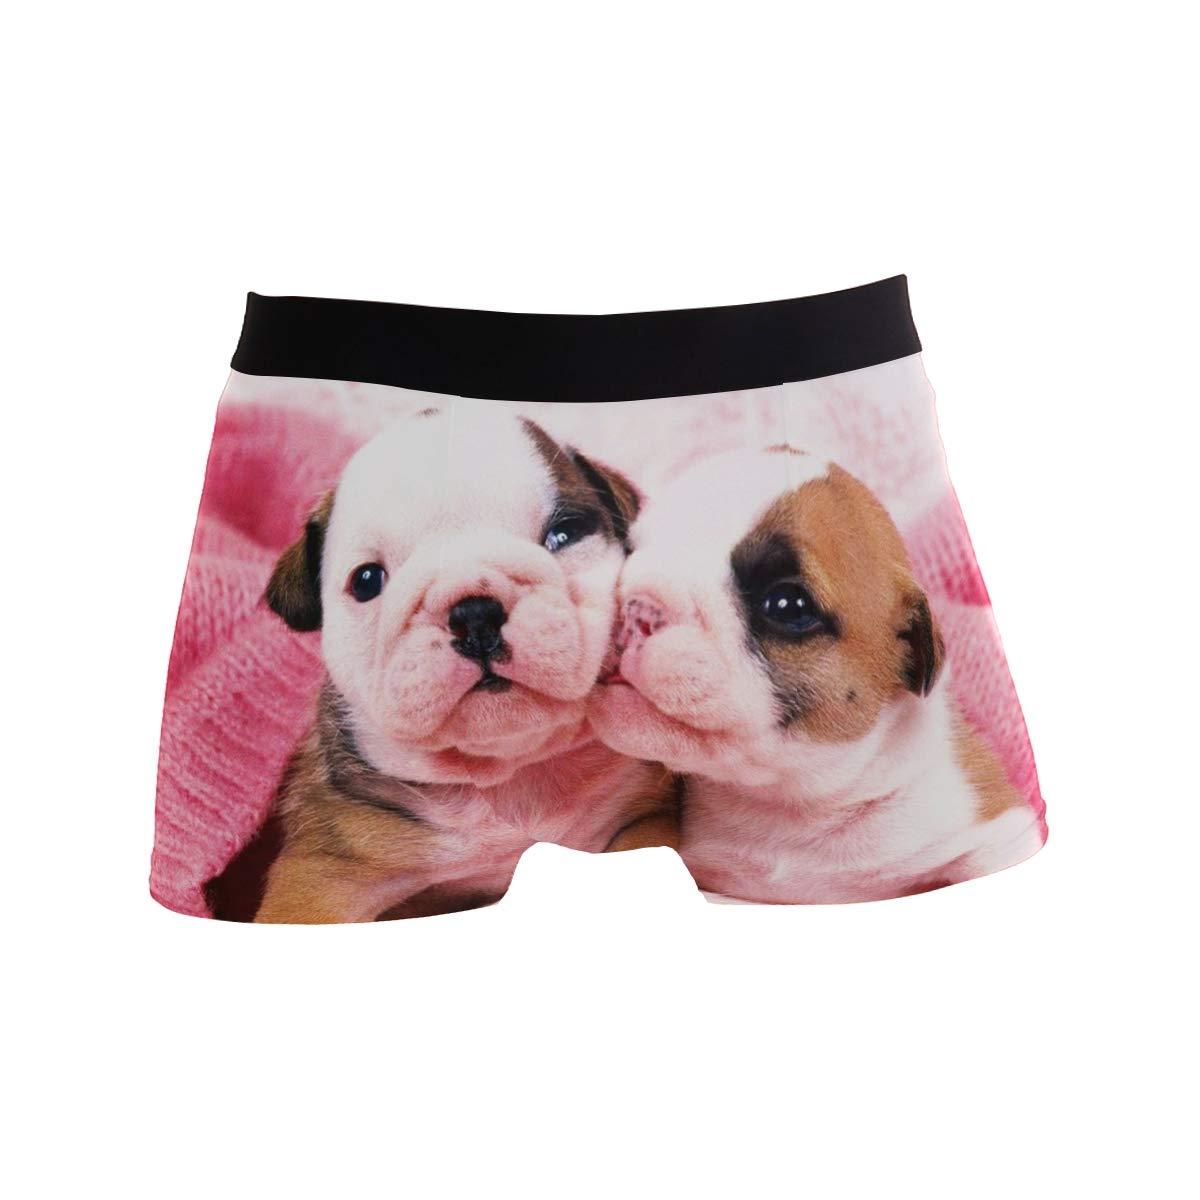 CATSDER Maxresdefault Boxer Briefs Mens Underwear Pack Seamless Comfort Soft